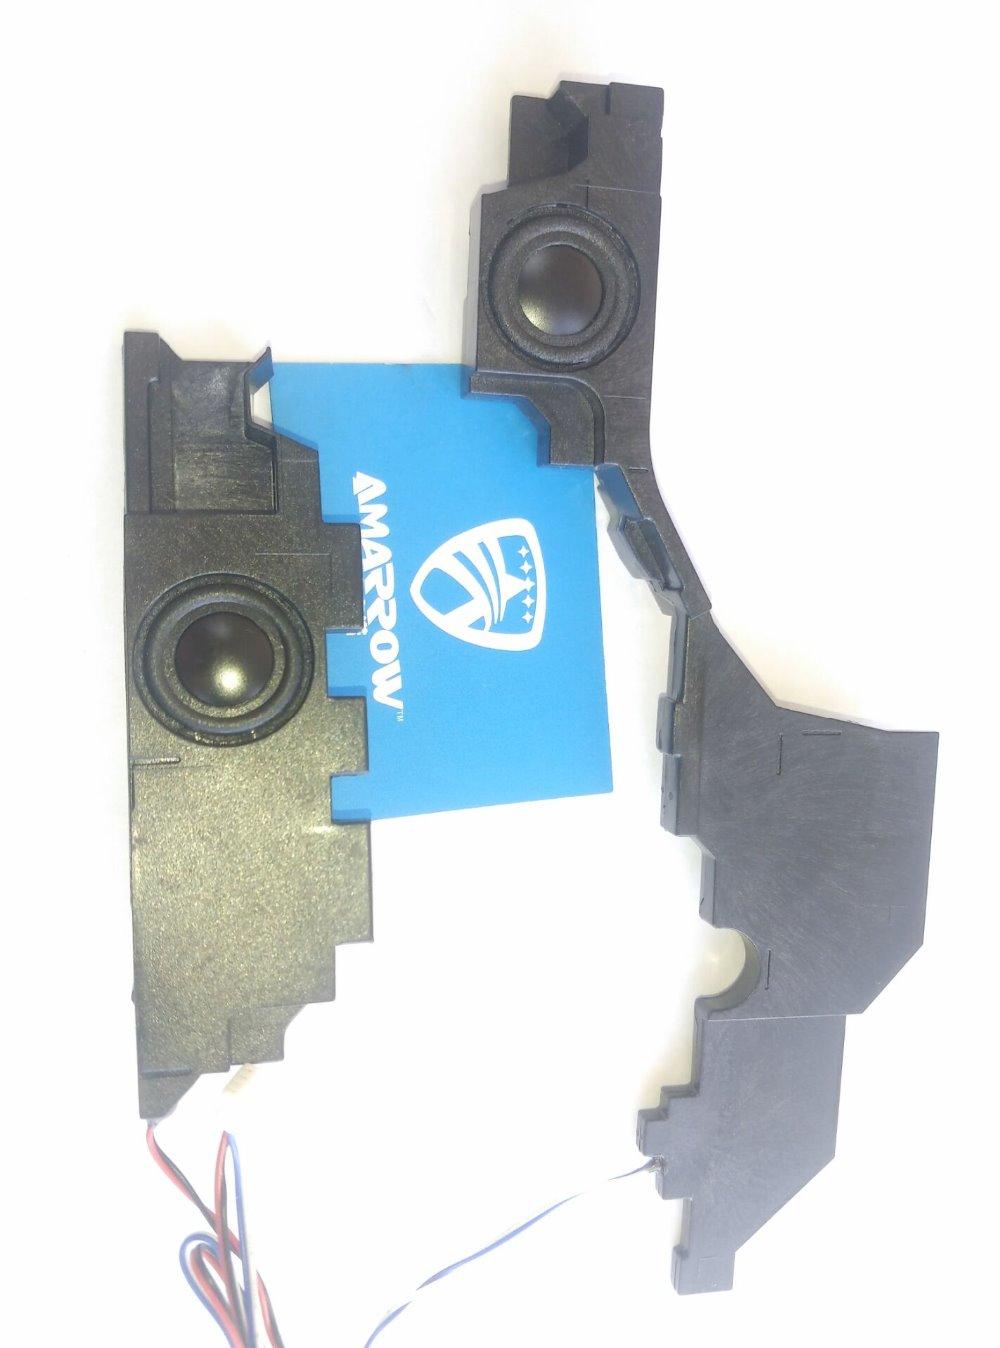 New Original Internal Speaker For ASUS K45V K45 A45V K45VD A45VD A85V R400V Built-in Speaker PK23000I200